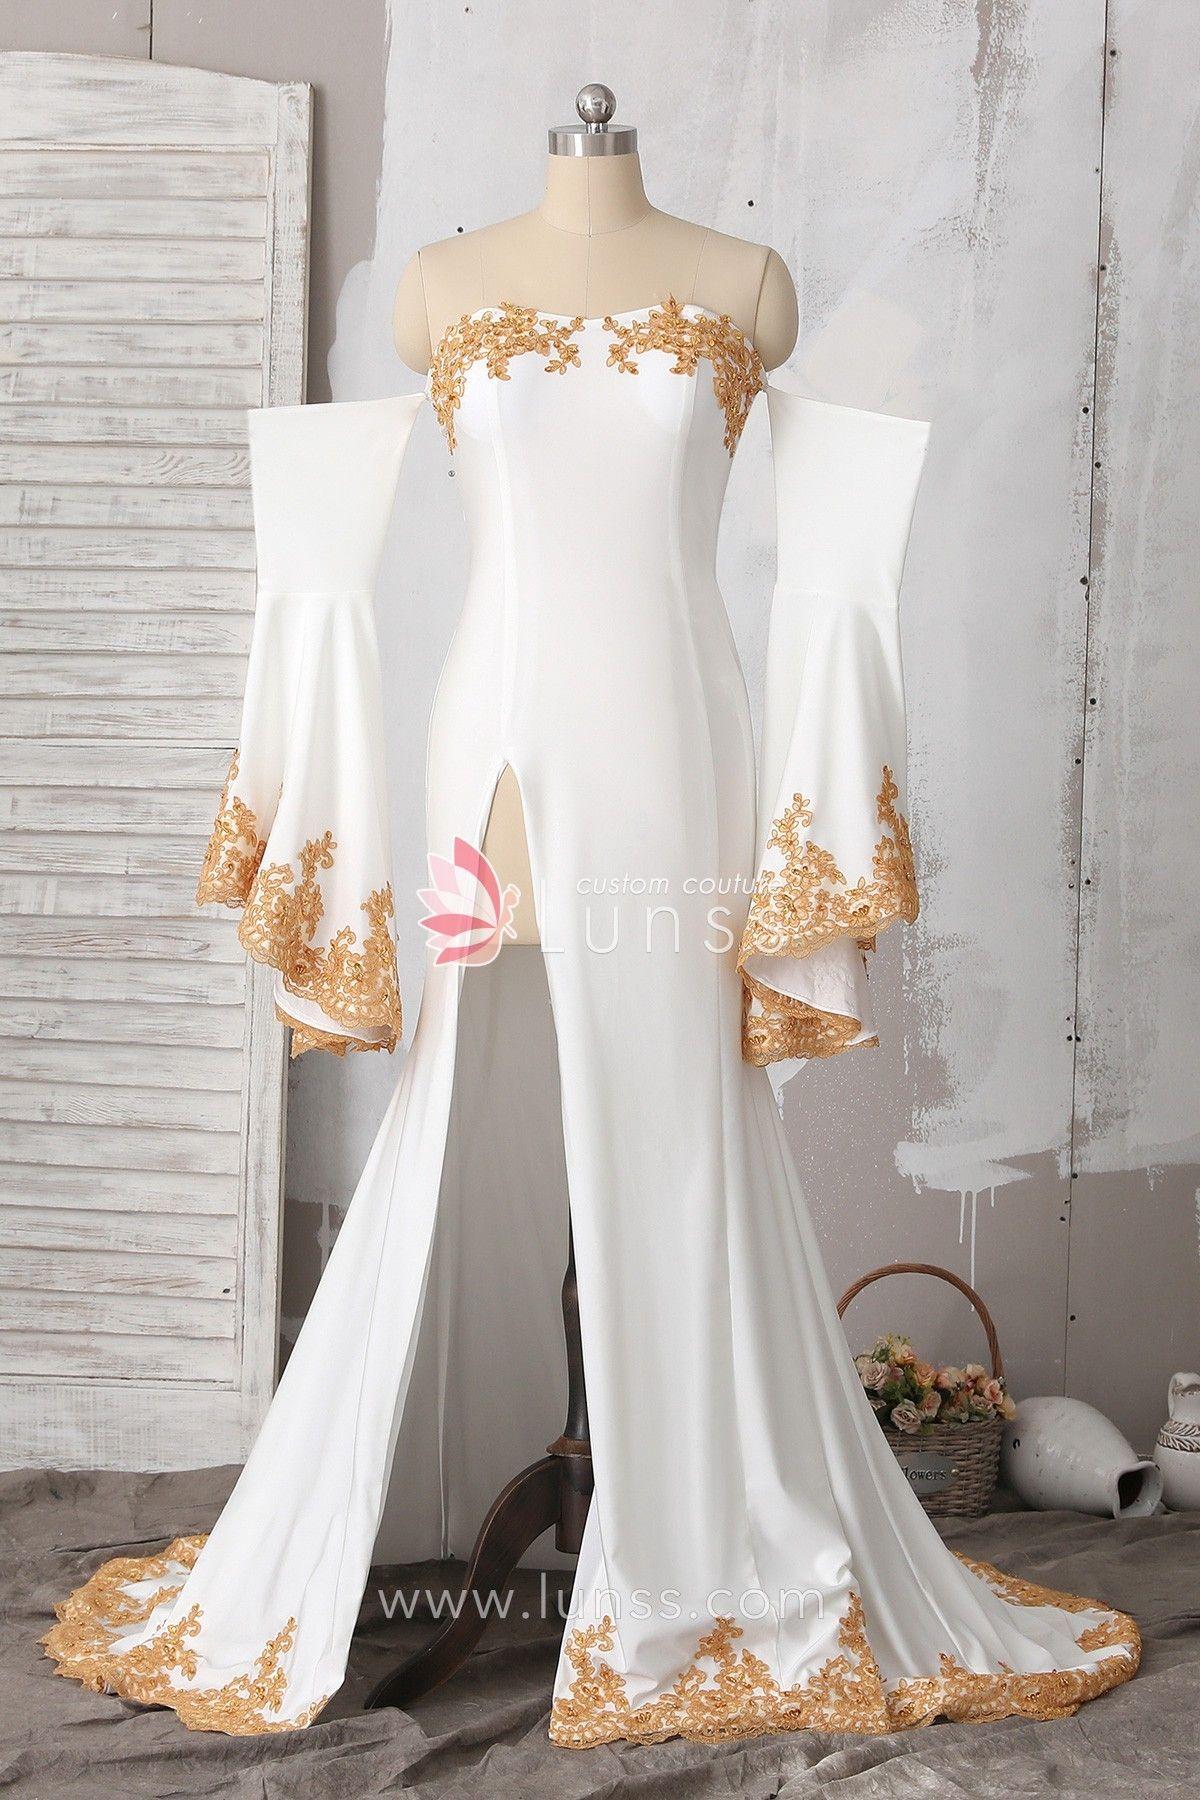 Ivory Off Shoulder Bell Sleeve Mermaid Prom Dress Masquerade Dresses White Prom Dress Long White Prom Dress [ 1800 x 1200 Pixel ]